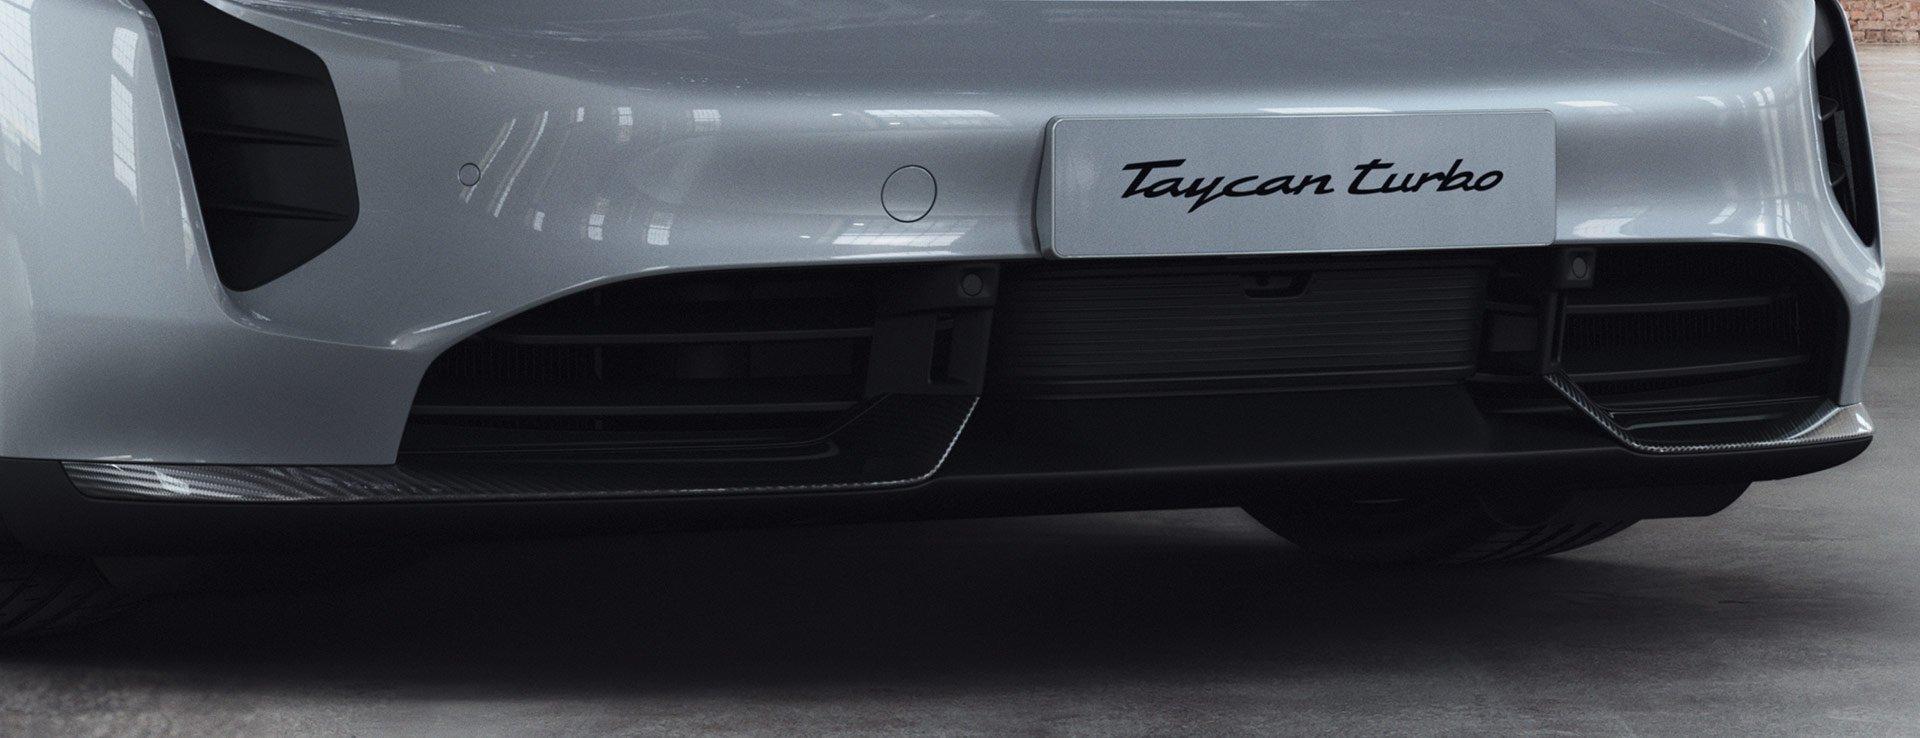 Porsche-Exclusive-Taycan-Turbo-10